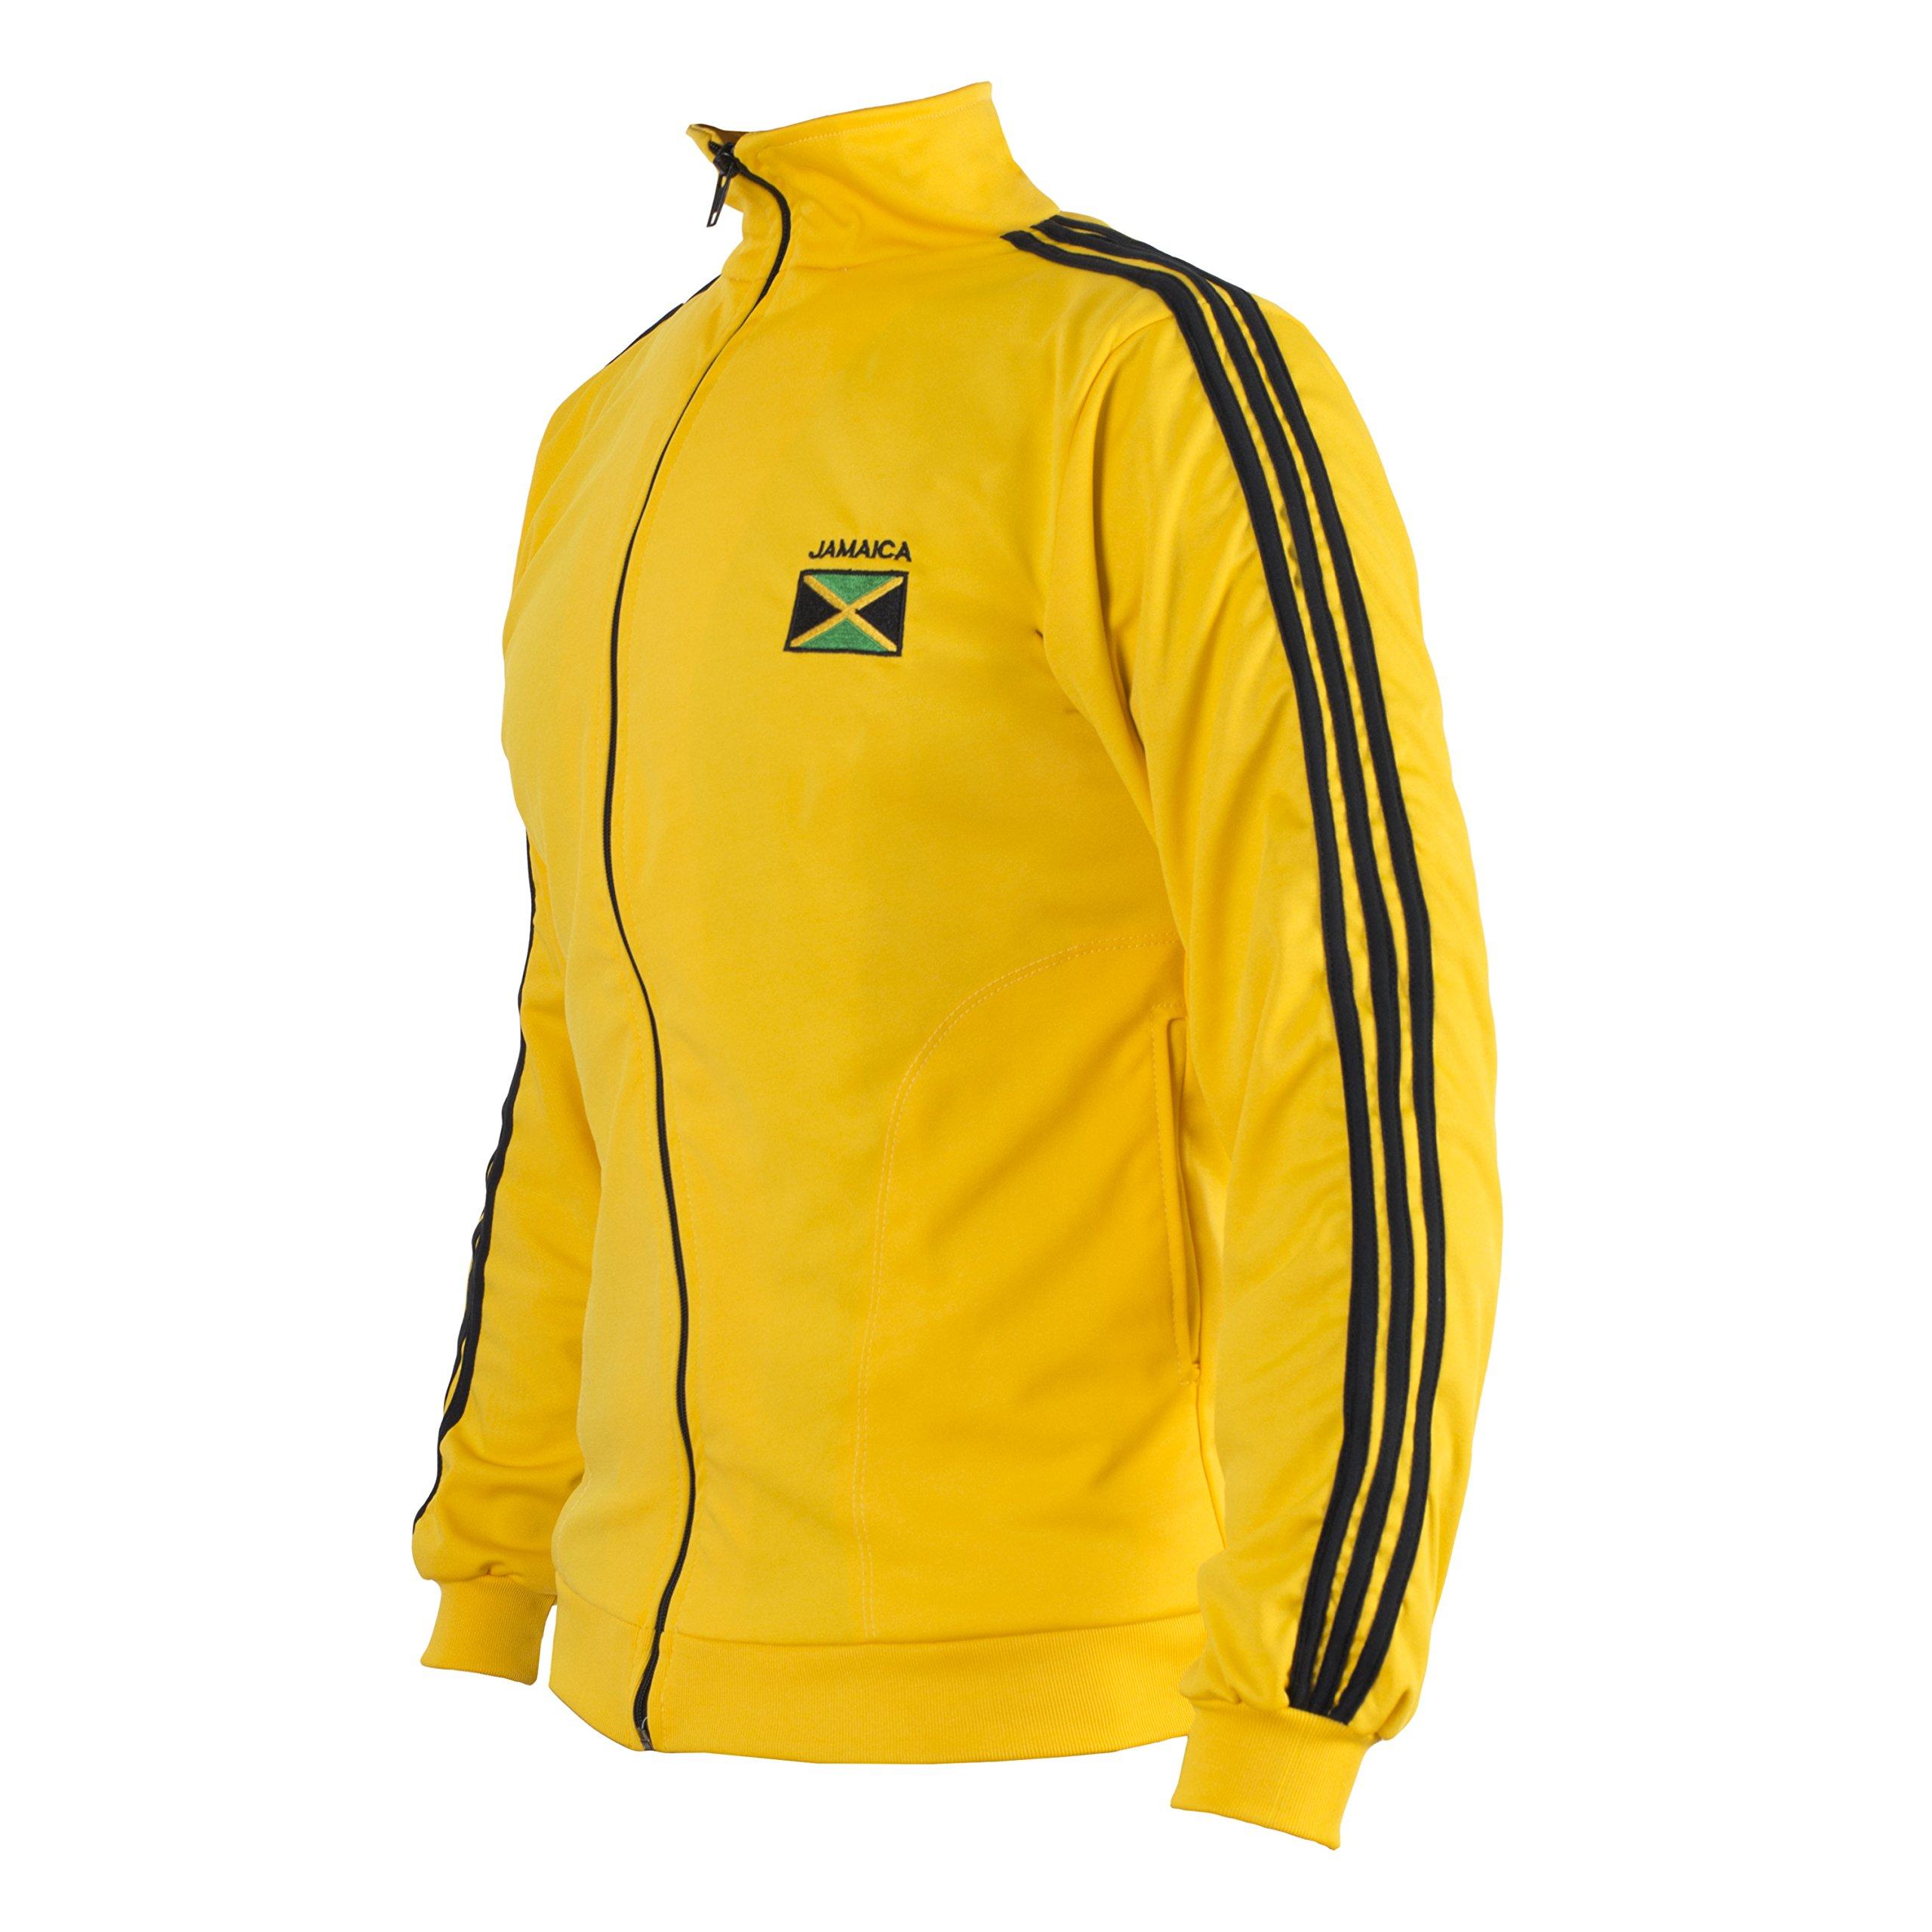 JL Sport Jamaican Flag Yellow Capoeira Zip-up Jacket Tracksuit Sweatshirt XXL